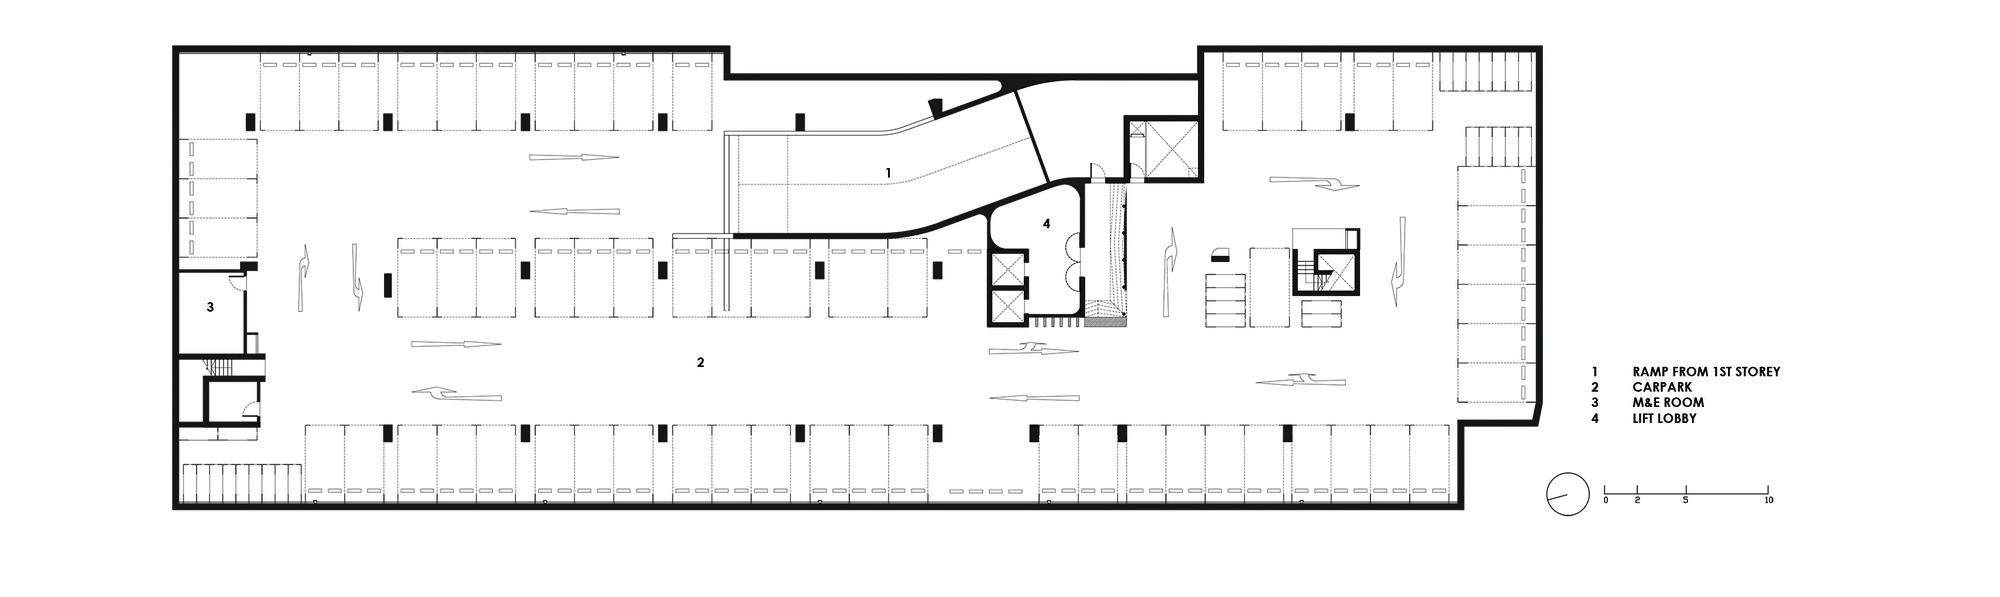 Galeria de igreja metodista k2ld architects 9 for House plan with basement parking